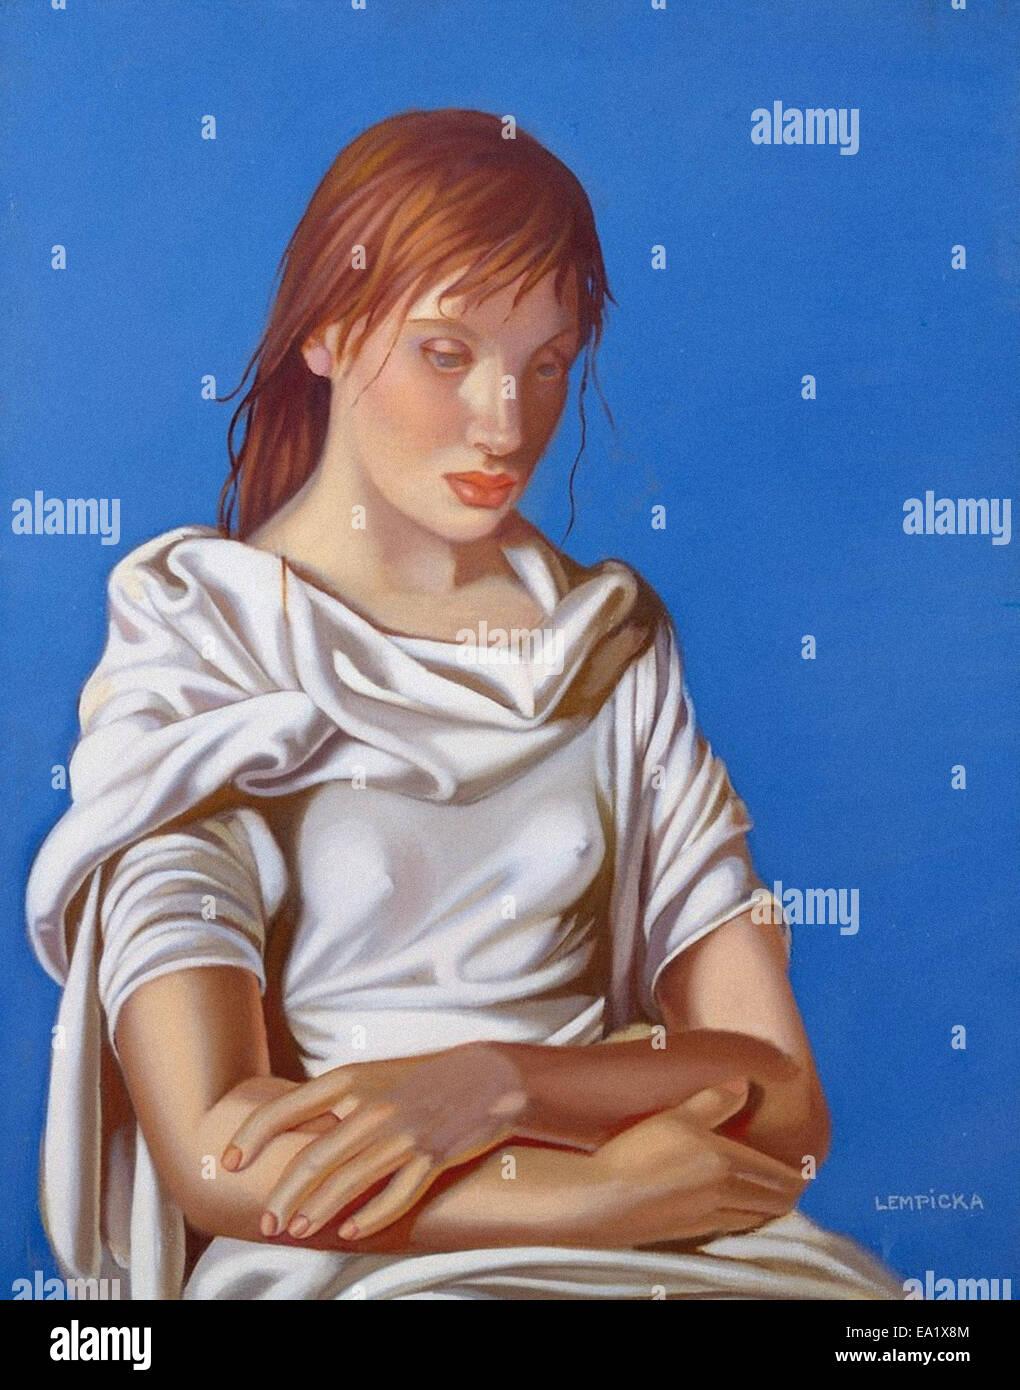 Tamara de Lempicka  Woman with Arms Crossed - Stock Image